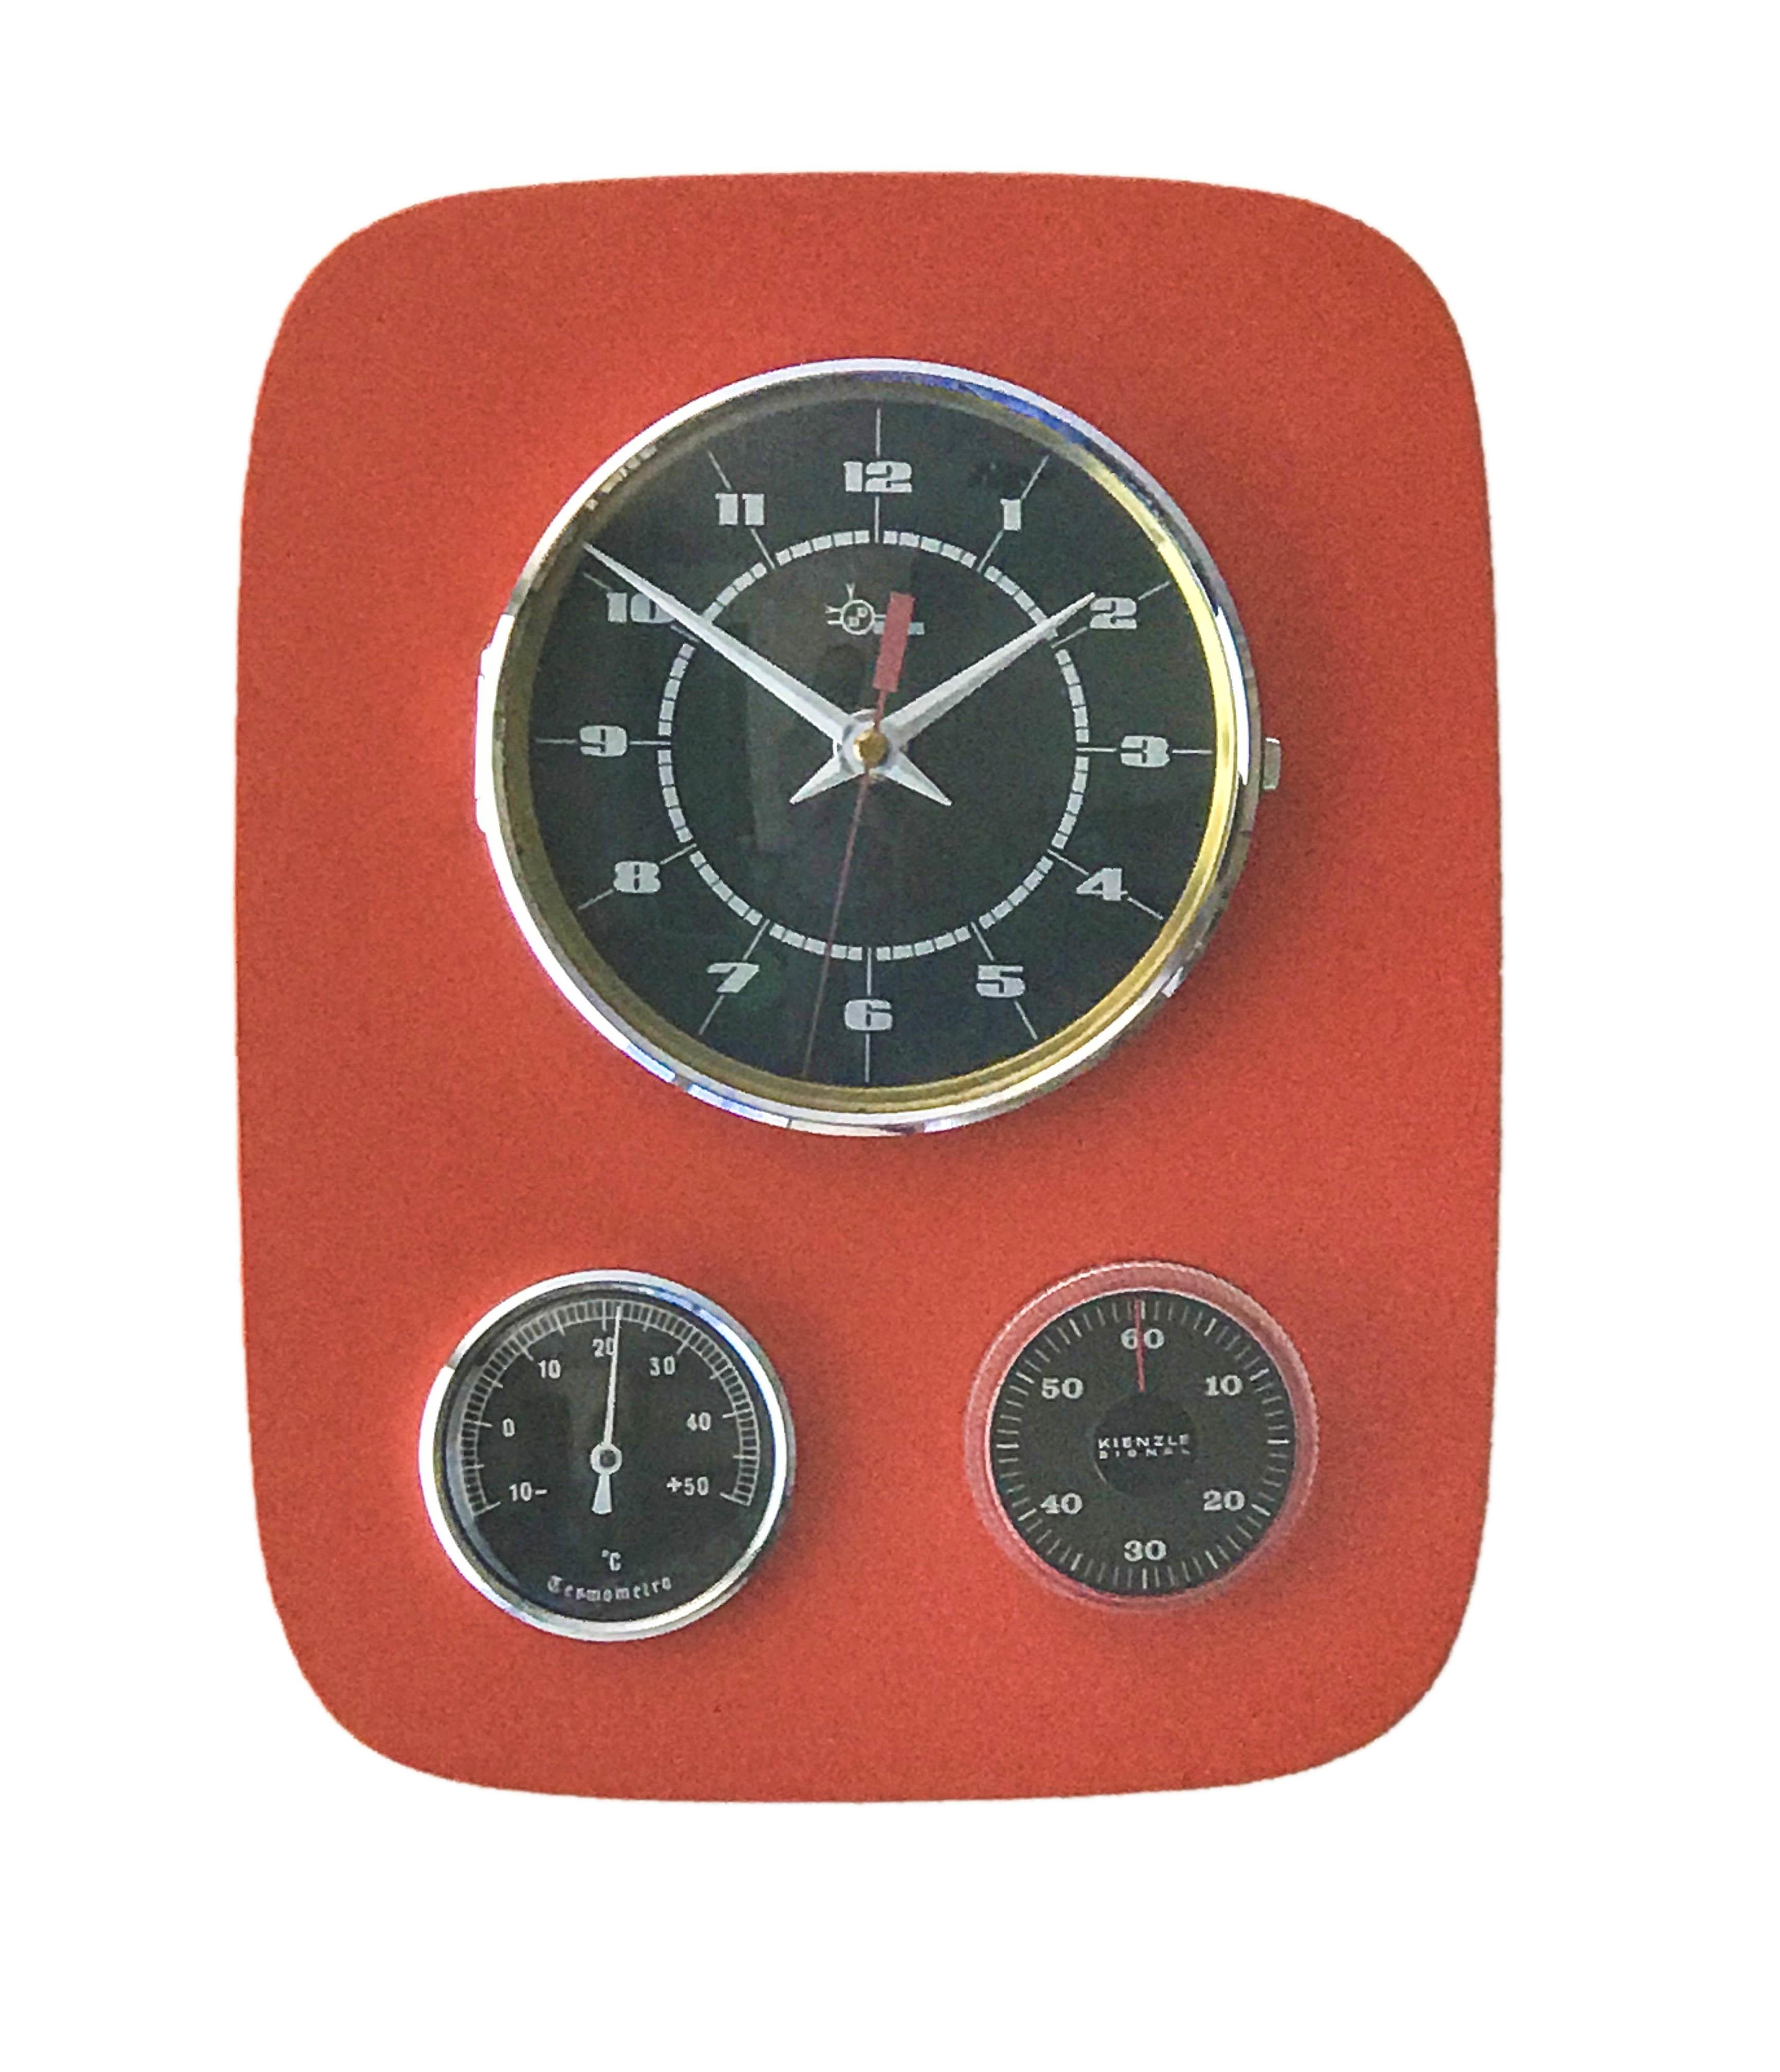 original-1972-d-d-numerical-faced-retro-clock-barometer-and-timer